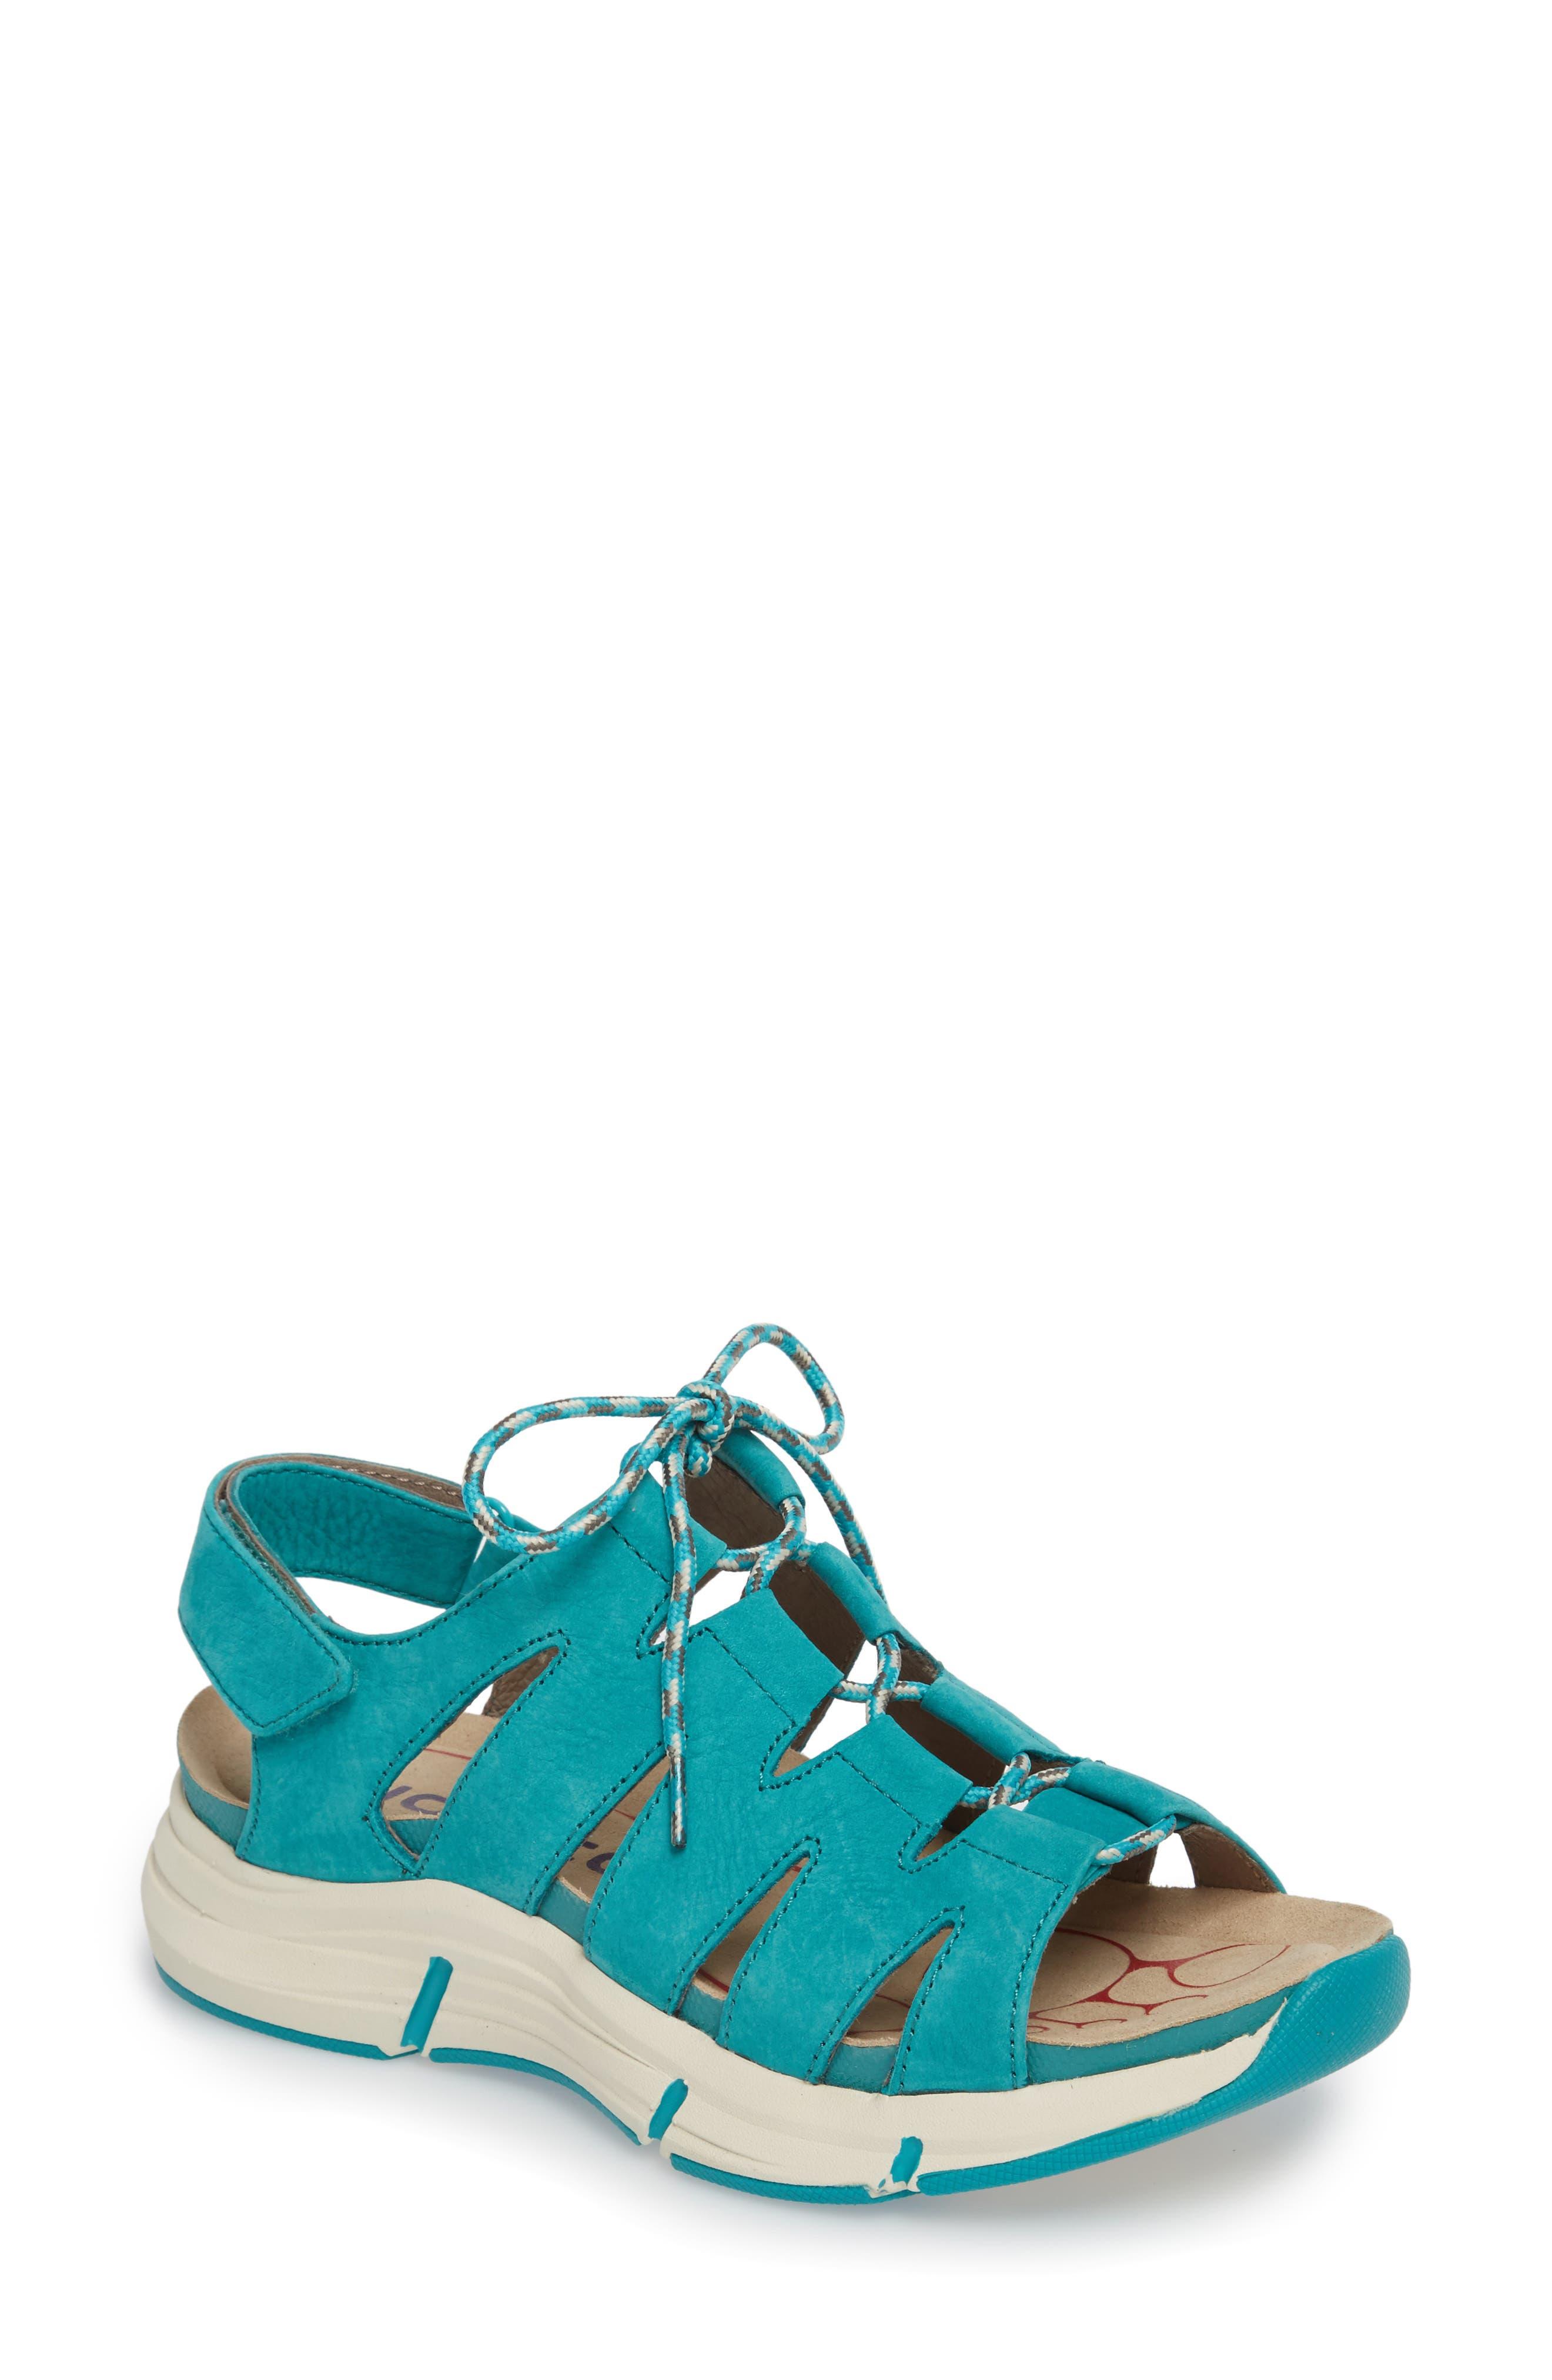 Olanda Ghillie Slingback Sandal,                         Main,                         color, Turquoise Leather